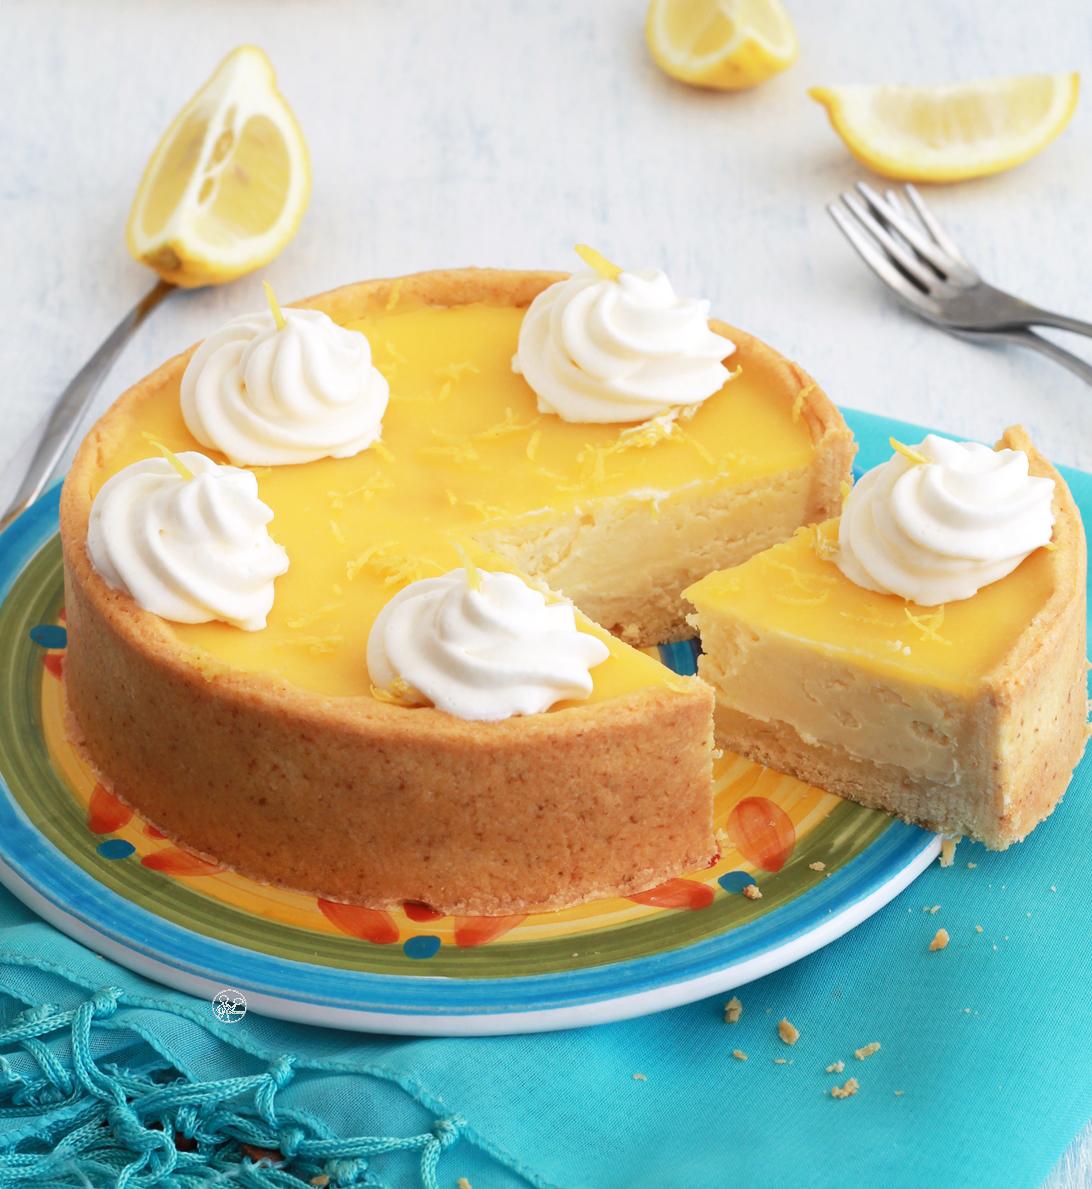 Cheesecake al limone senza glutine - La Cassata Celiaca